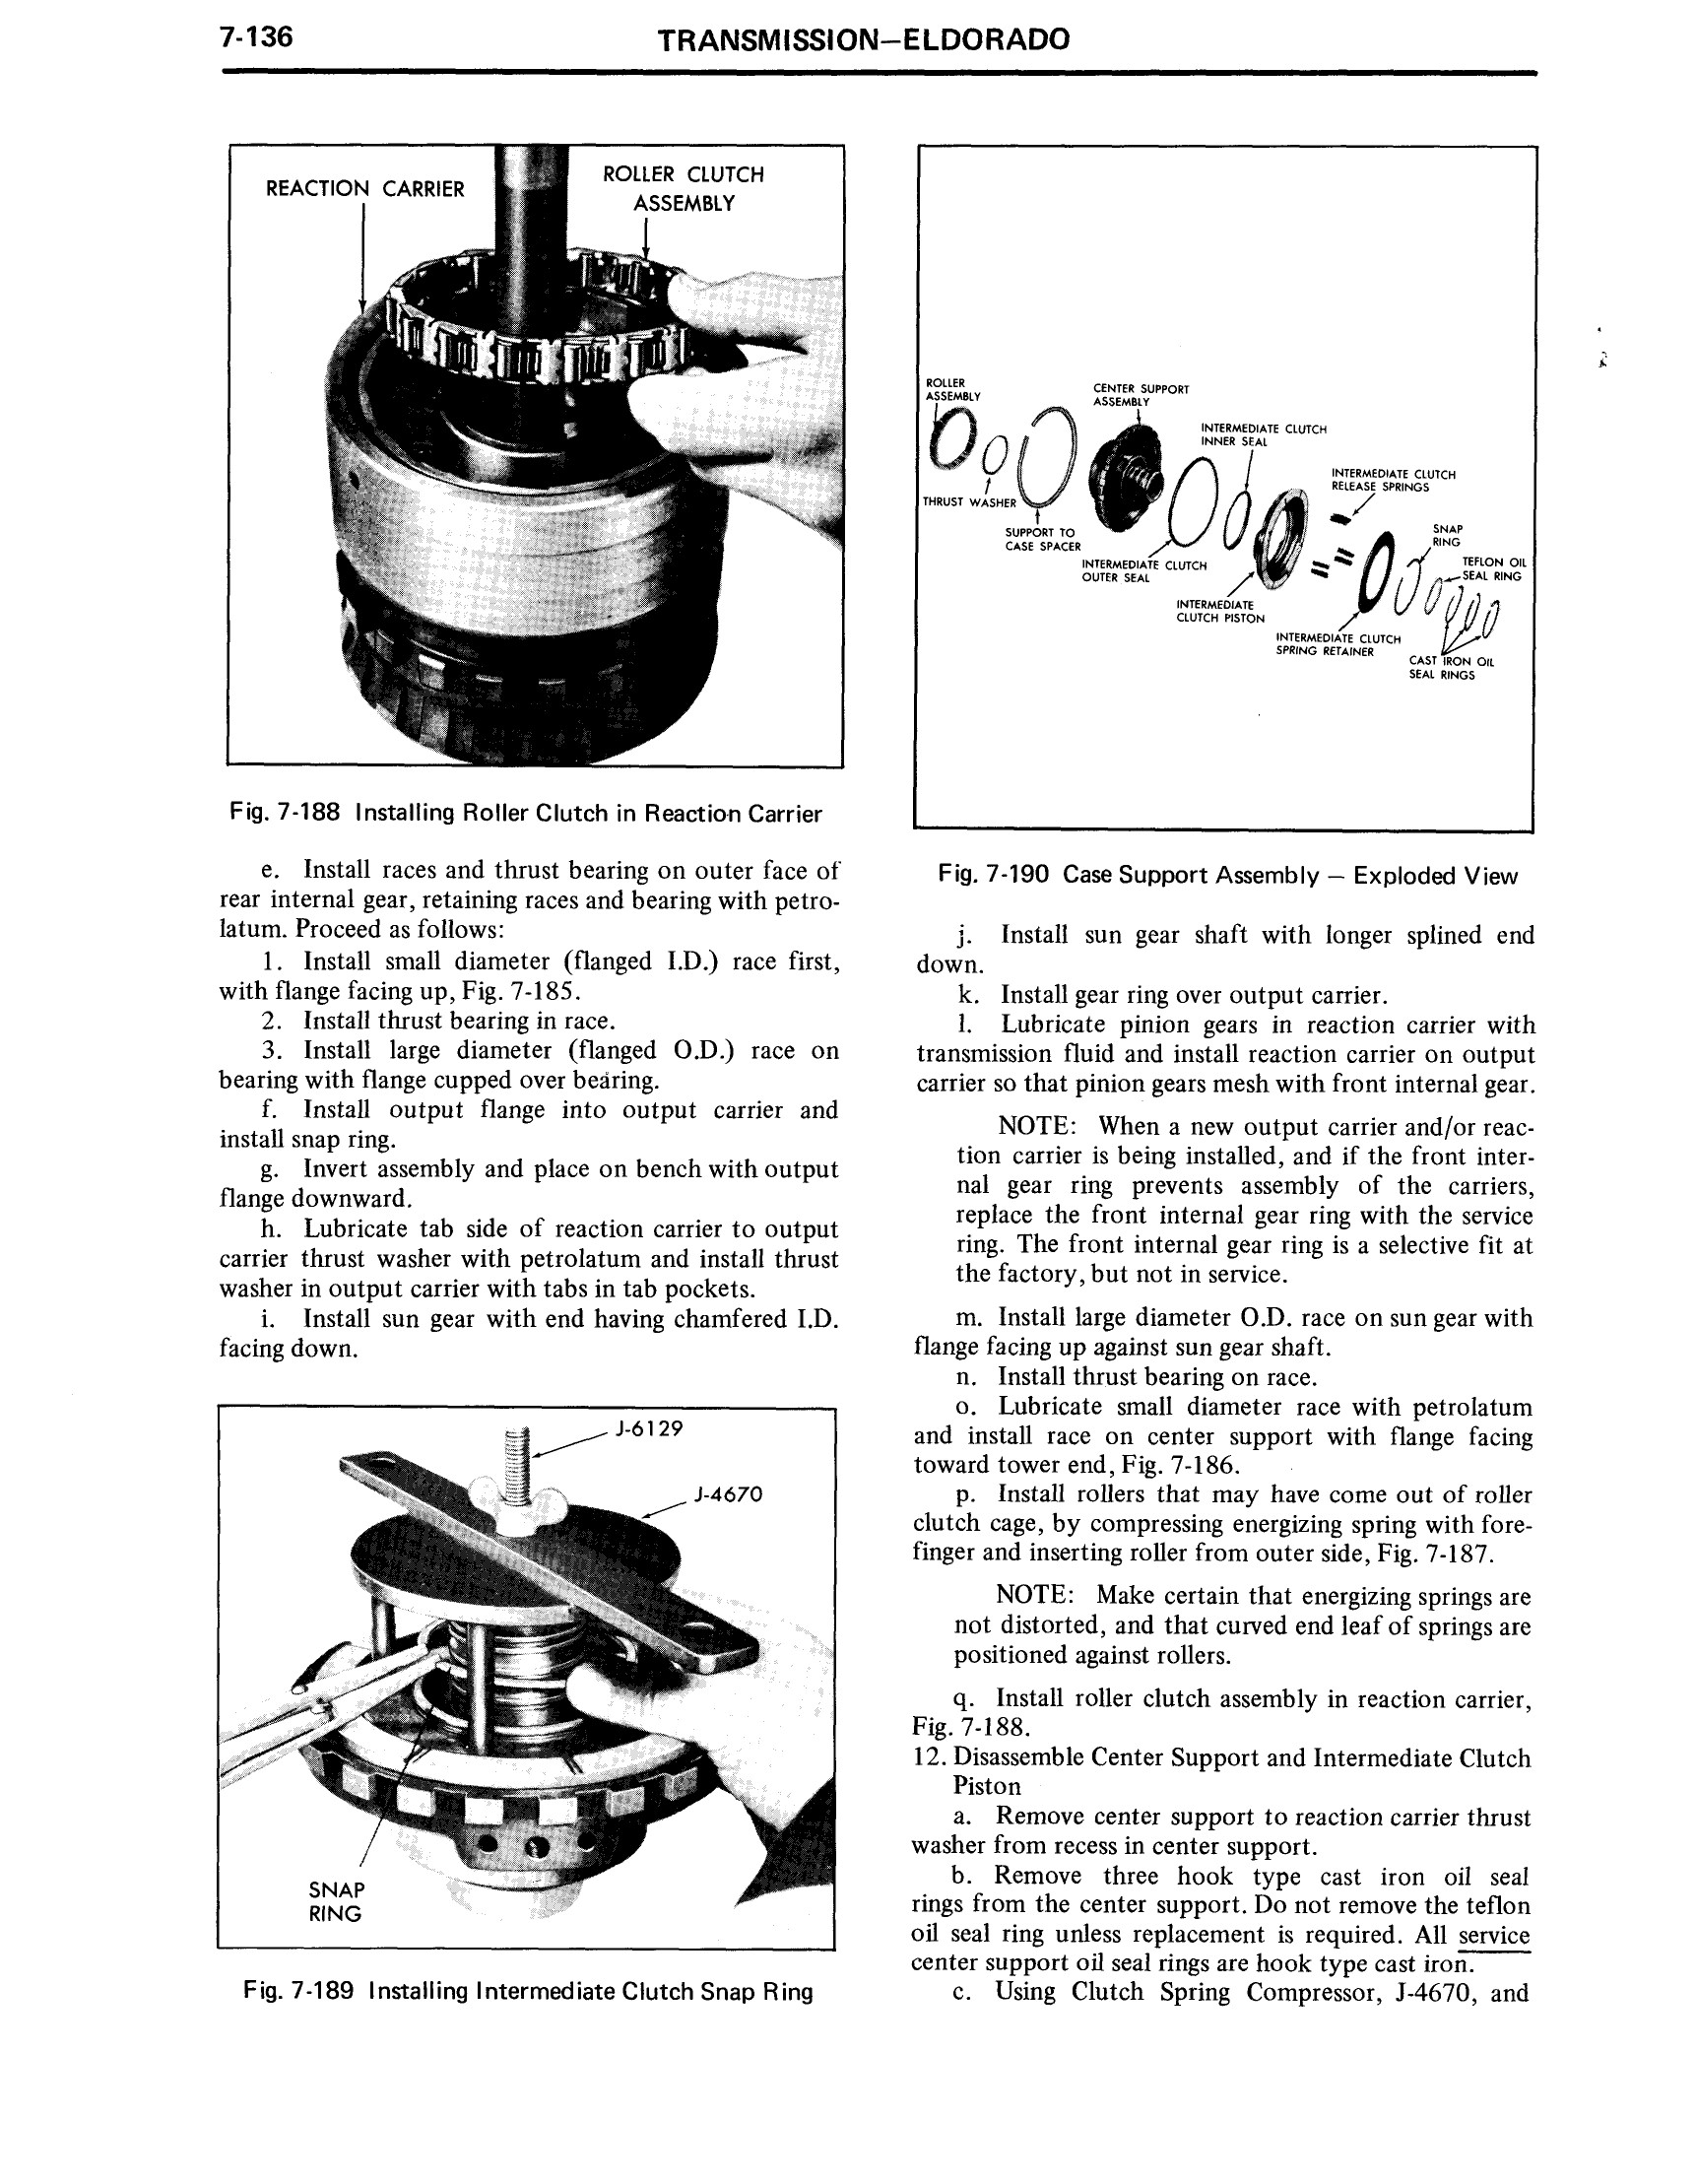 1971 Cadillac Shop Manual- Transmission Page 136 of 156